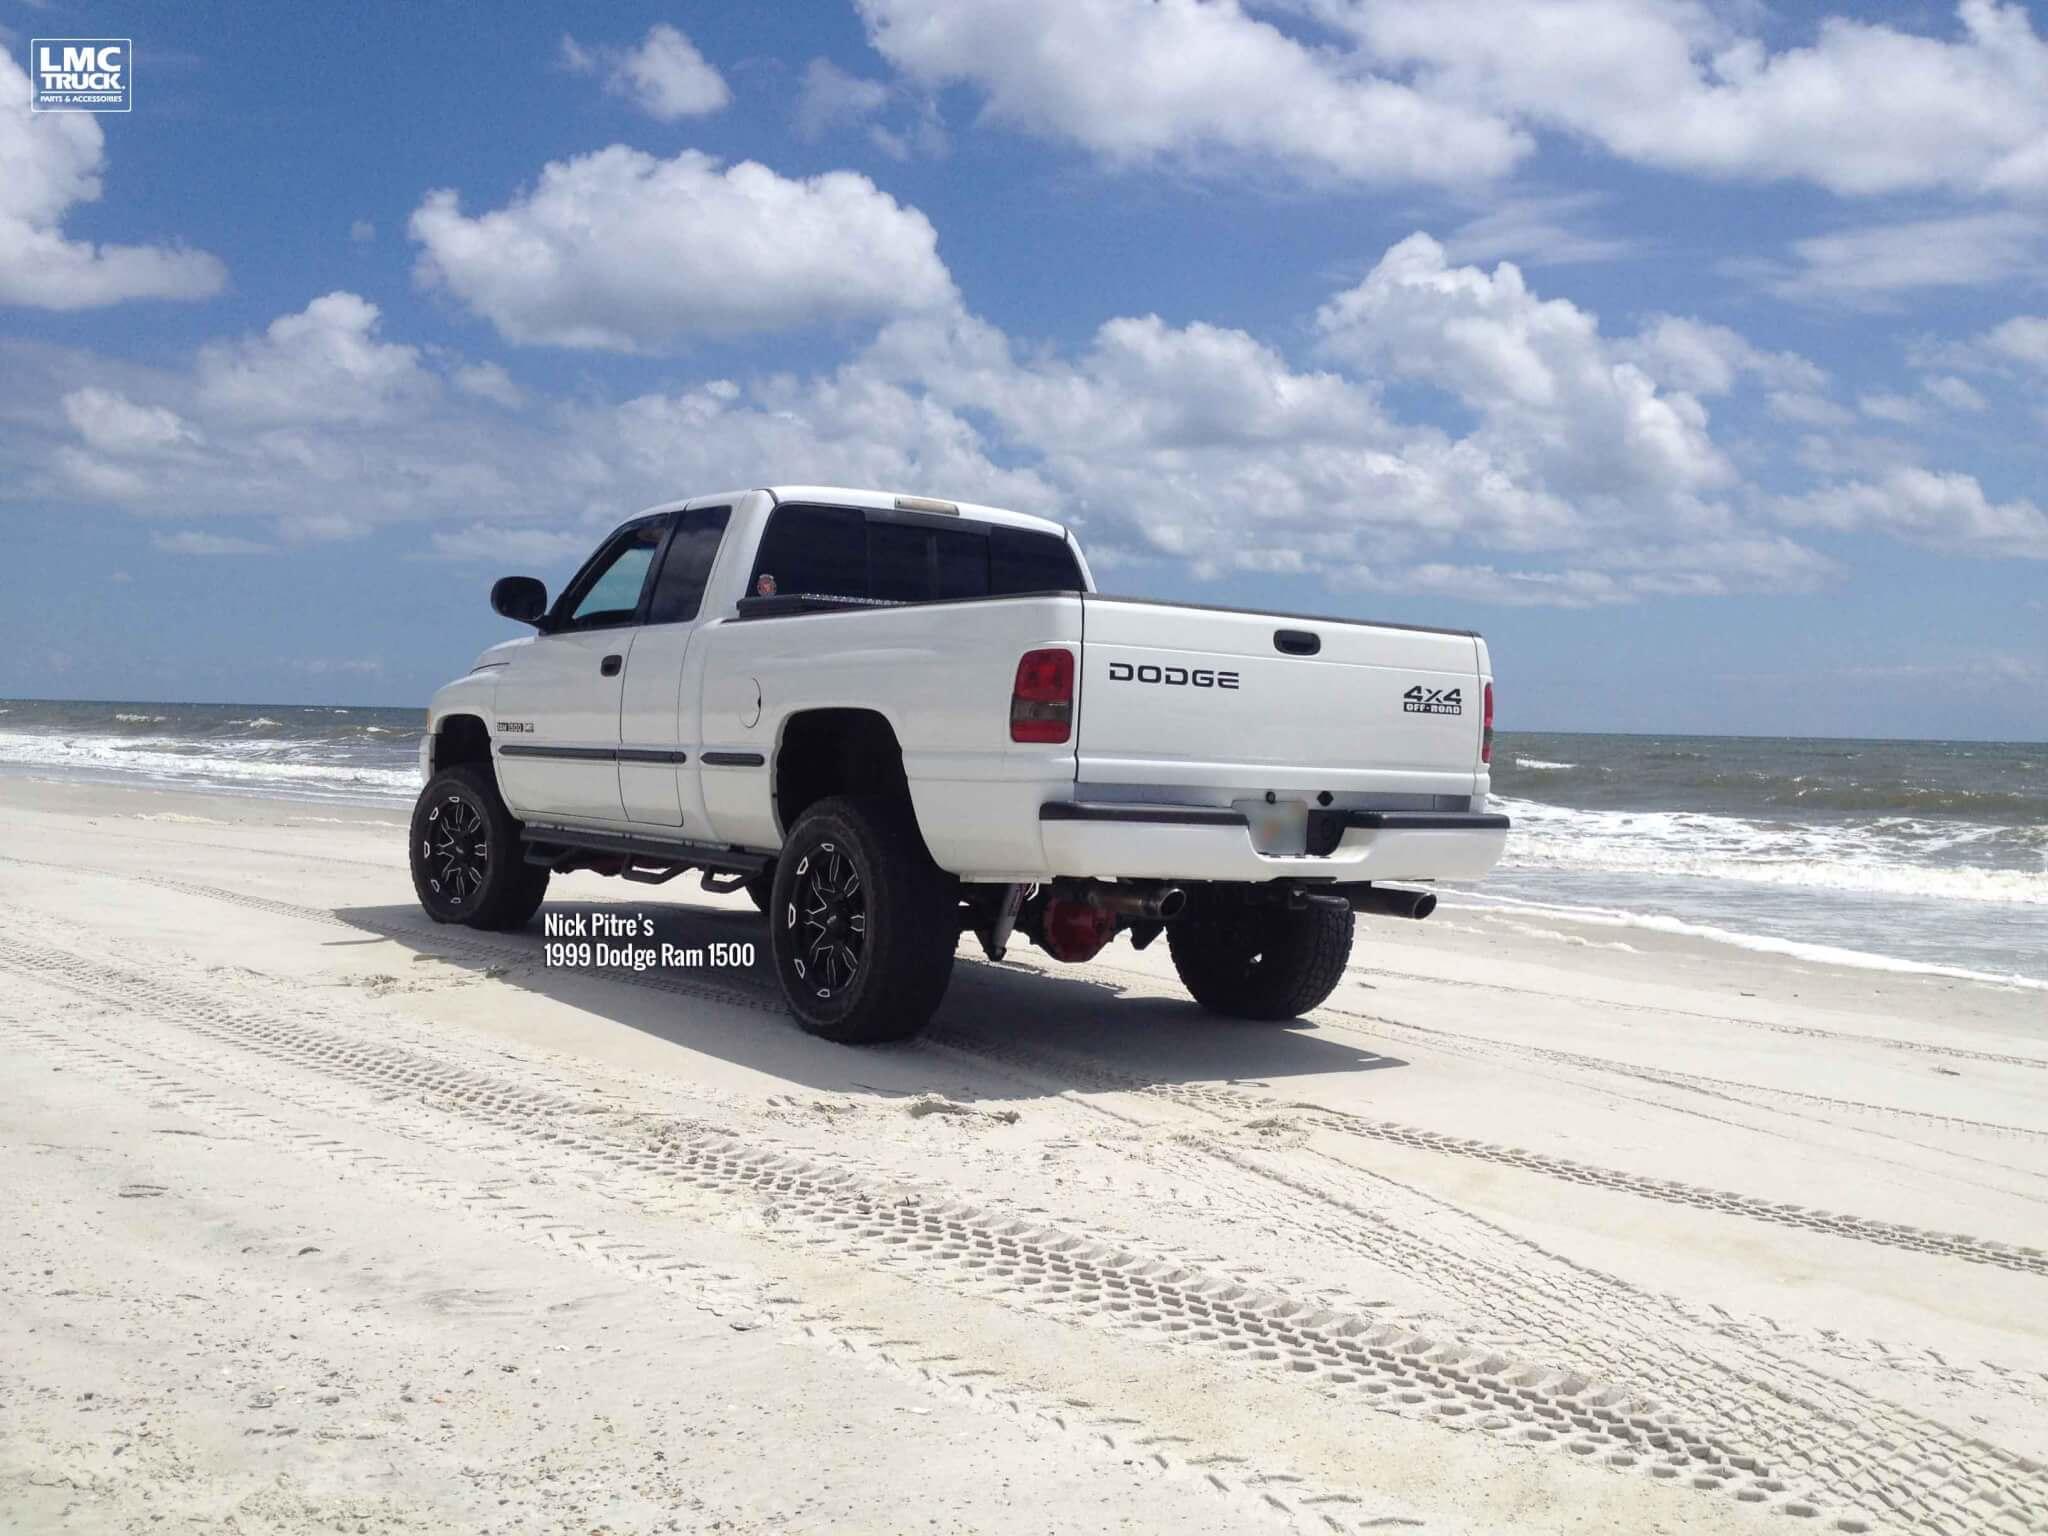 1999 Dodge - Nick P  - LMC Truck Life